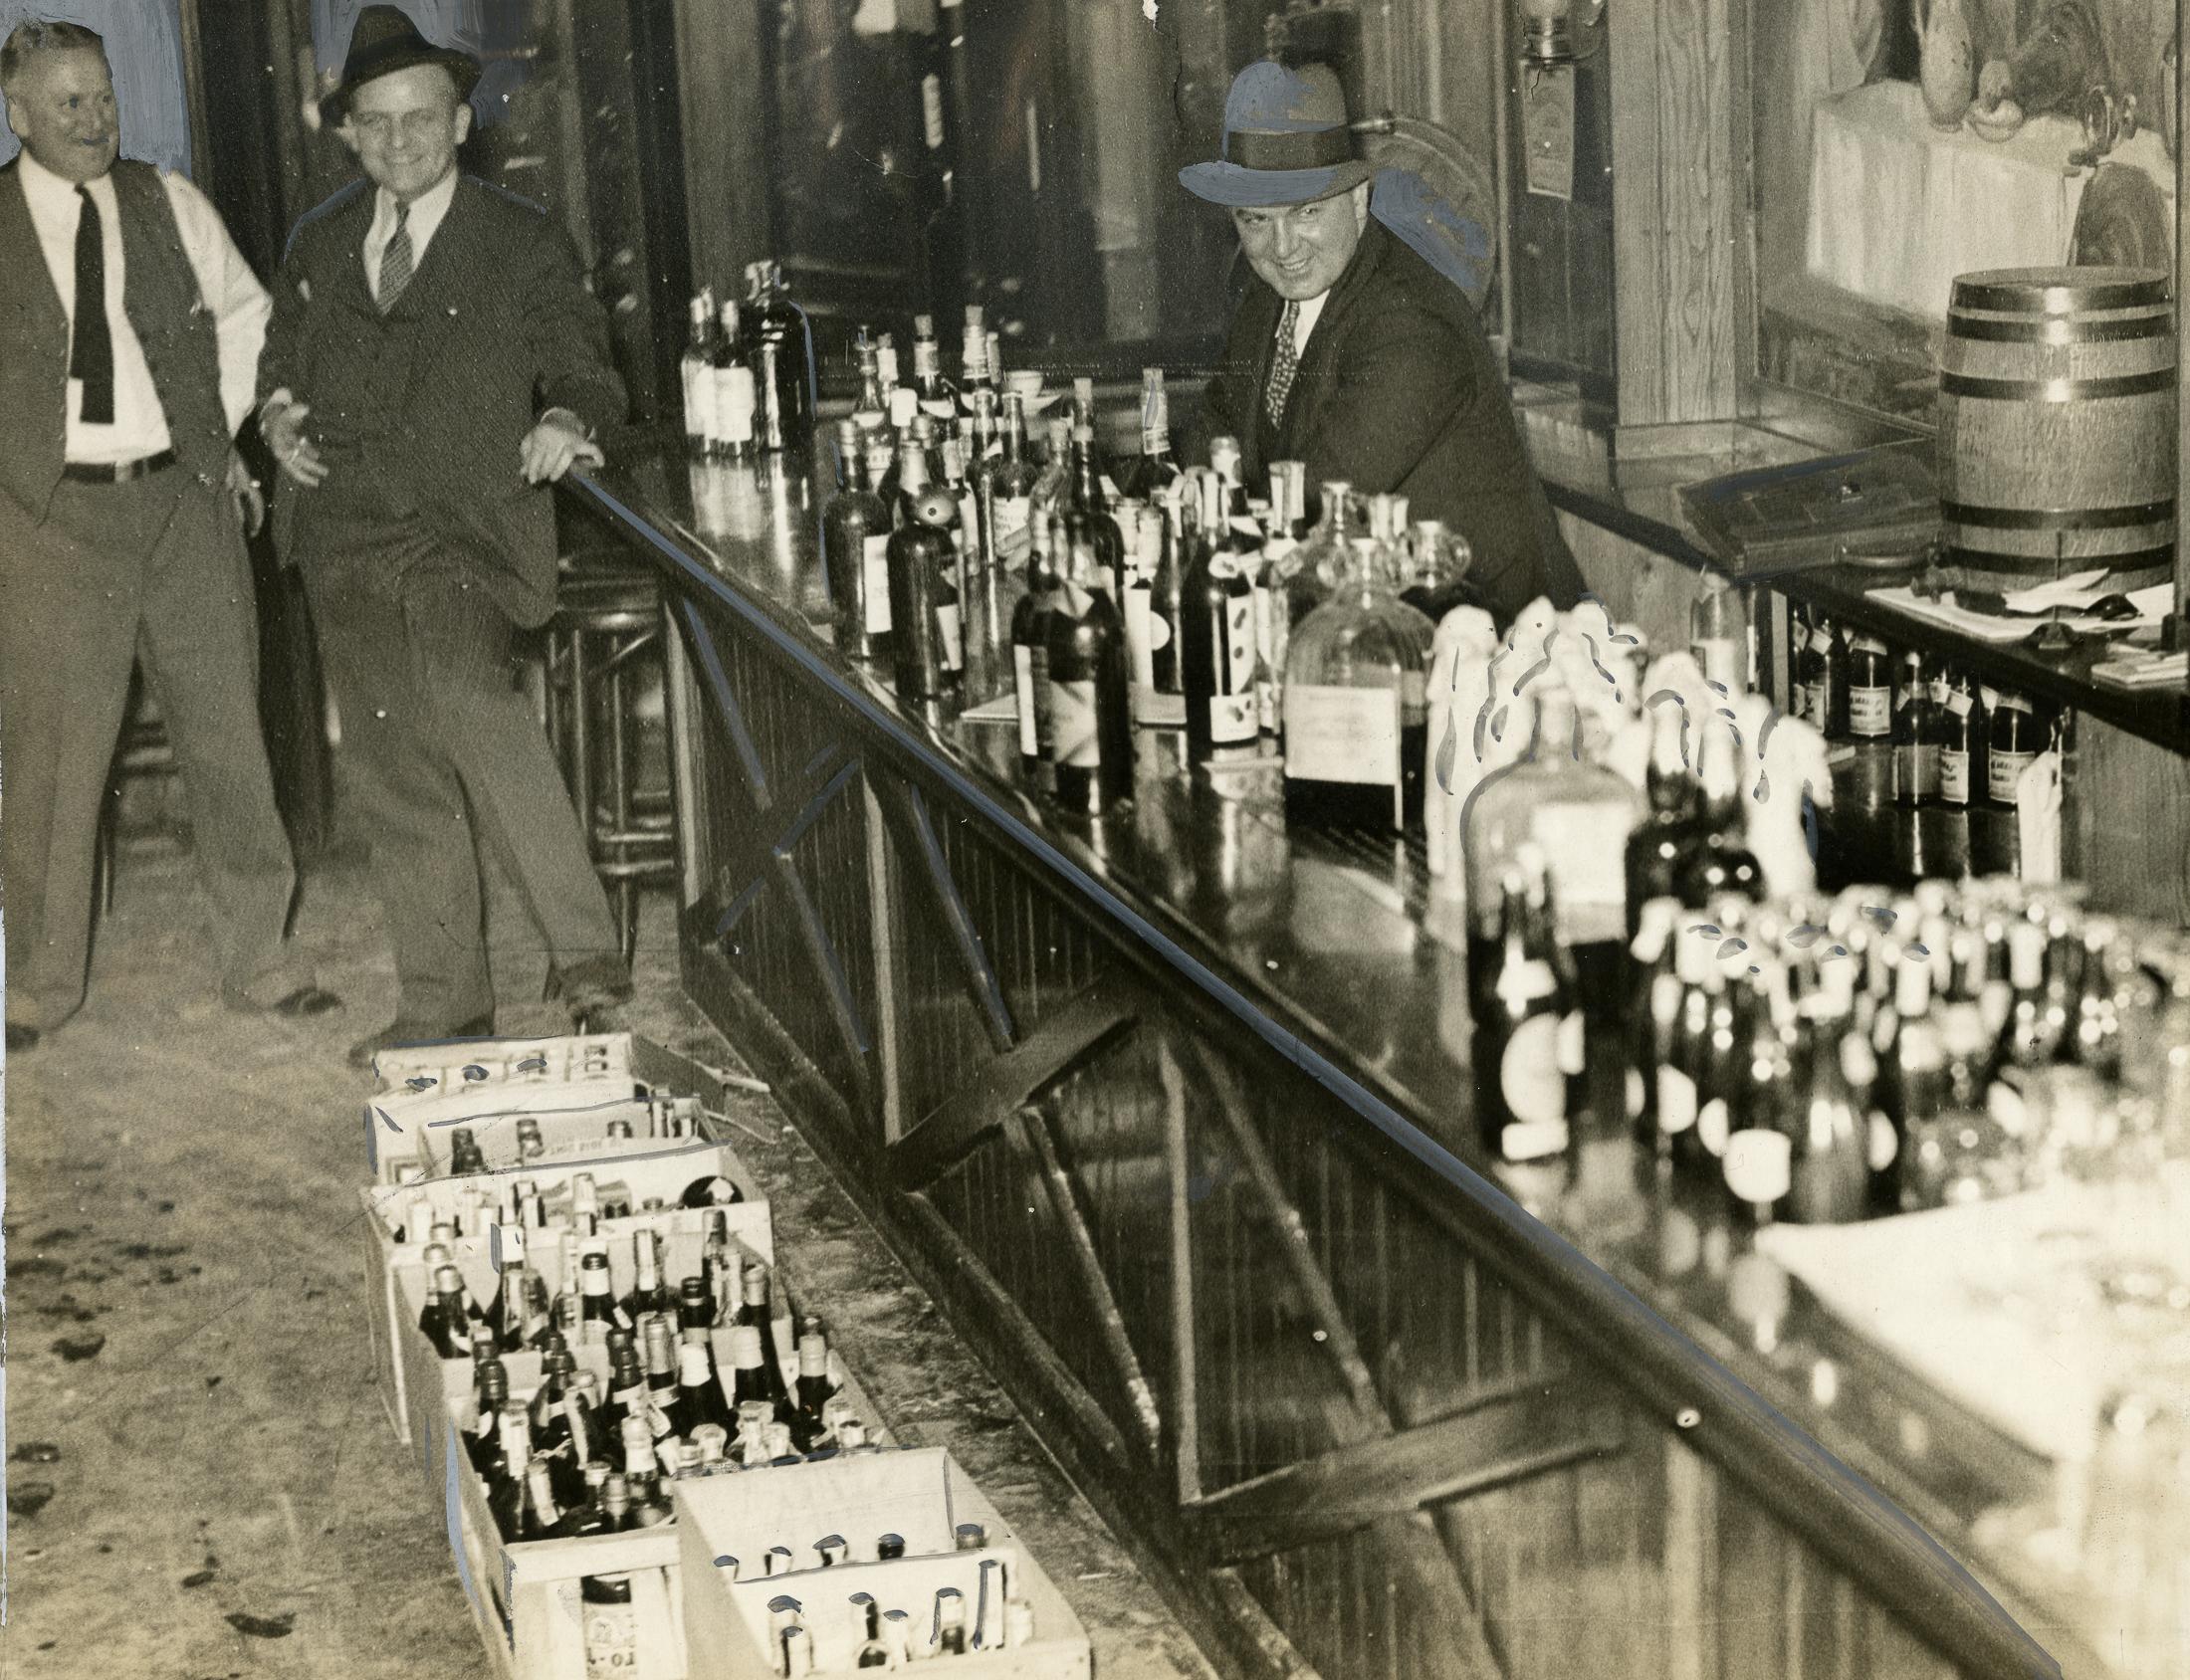 Philadelphia was 'wet as the Atlantic Ocean' in 1920s ...